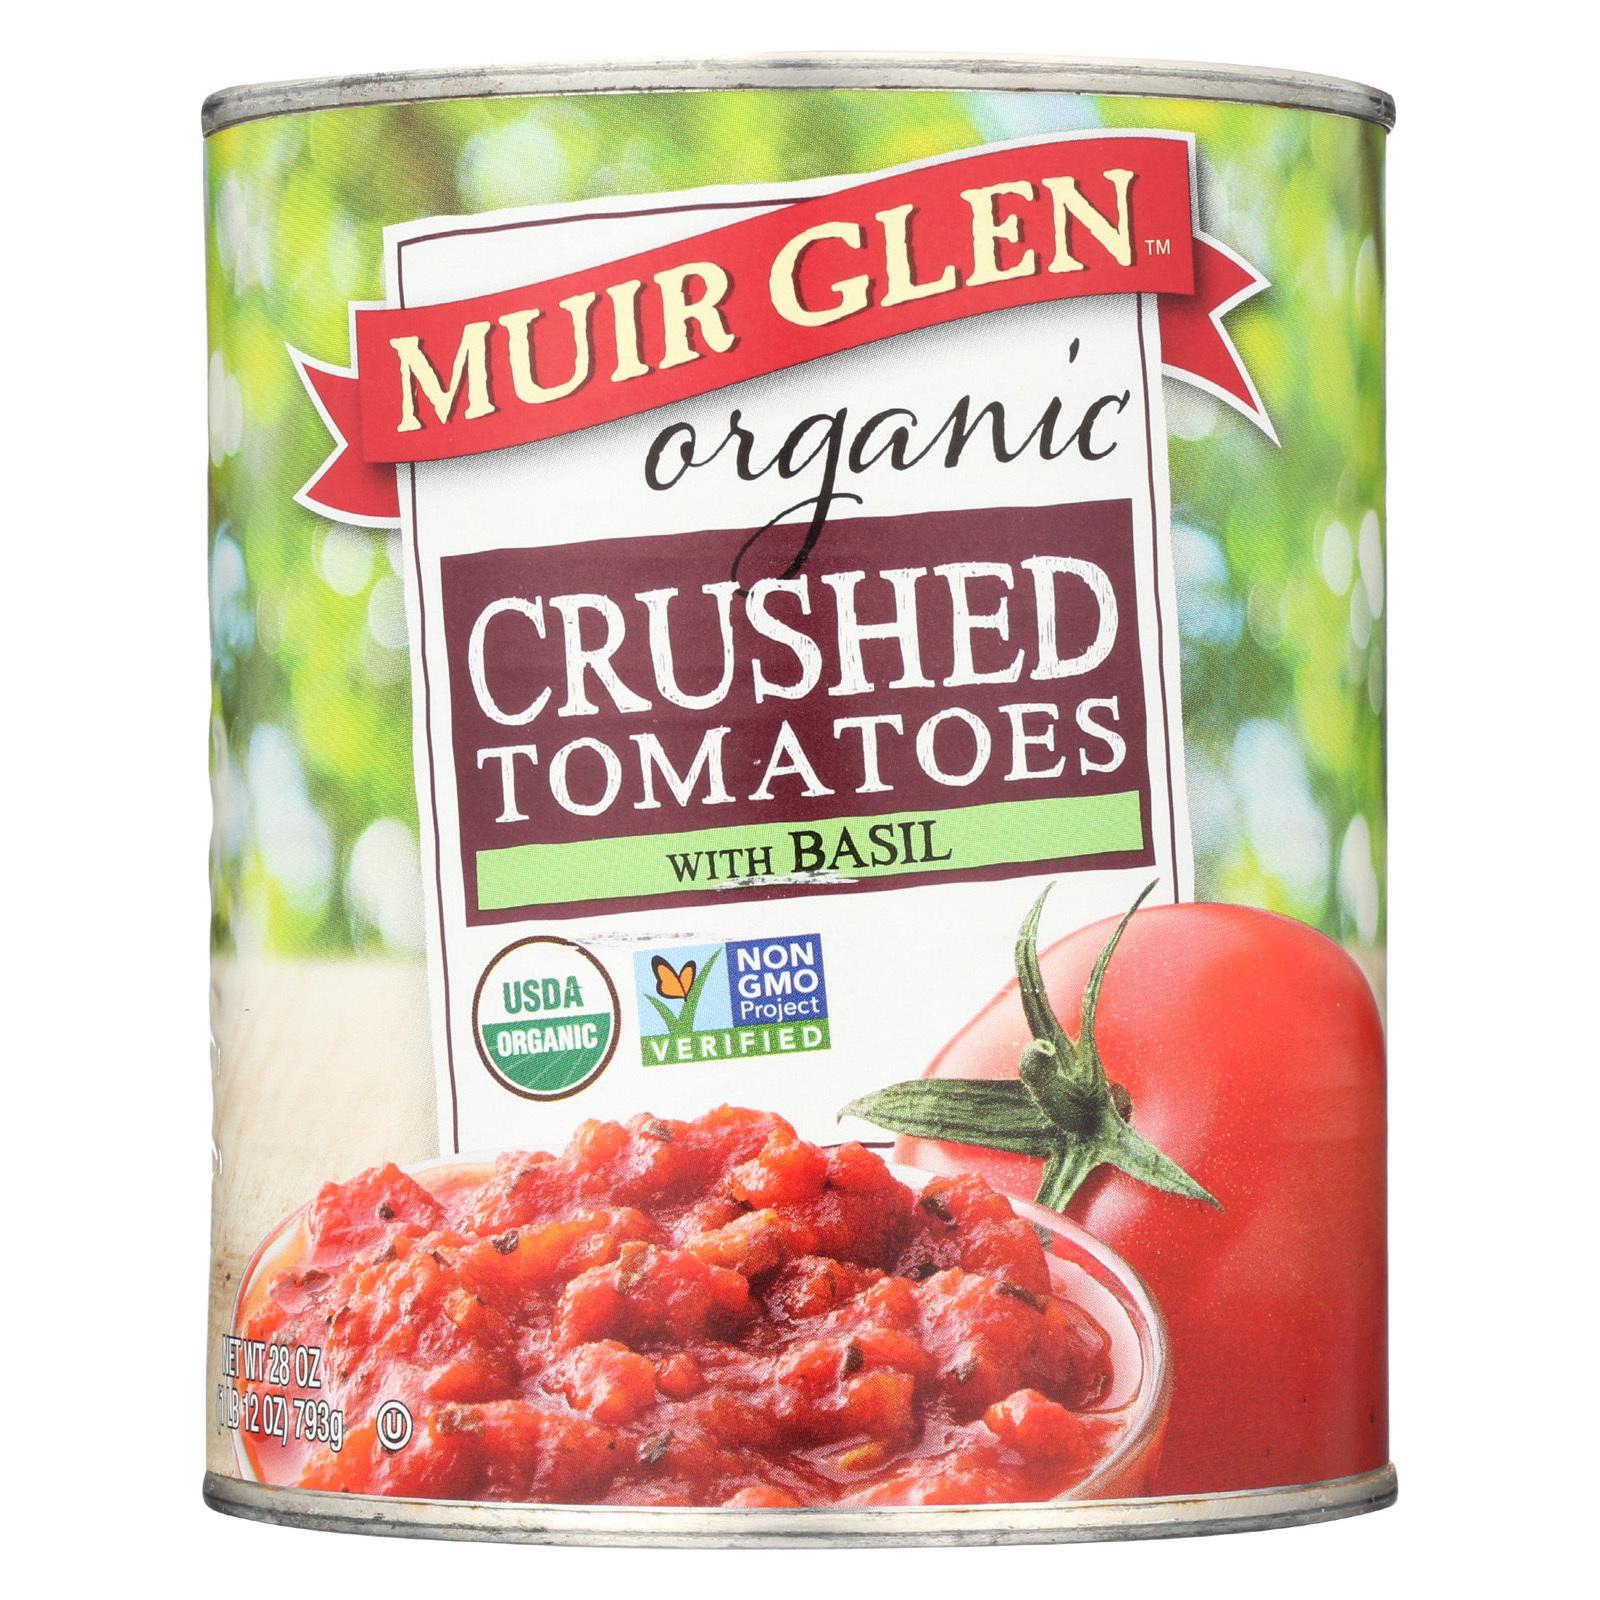 Muir Glen Organic Tomatoes - Crushedwith Basil - 28 oz